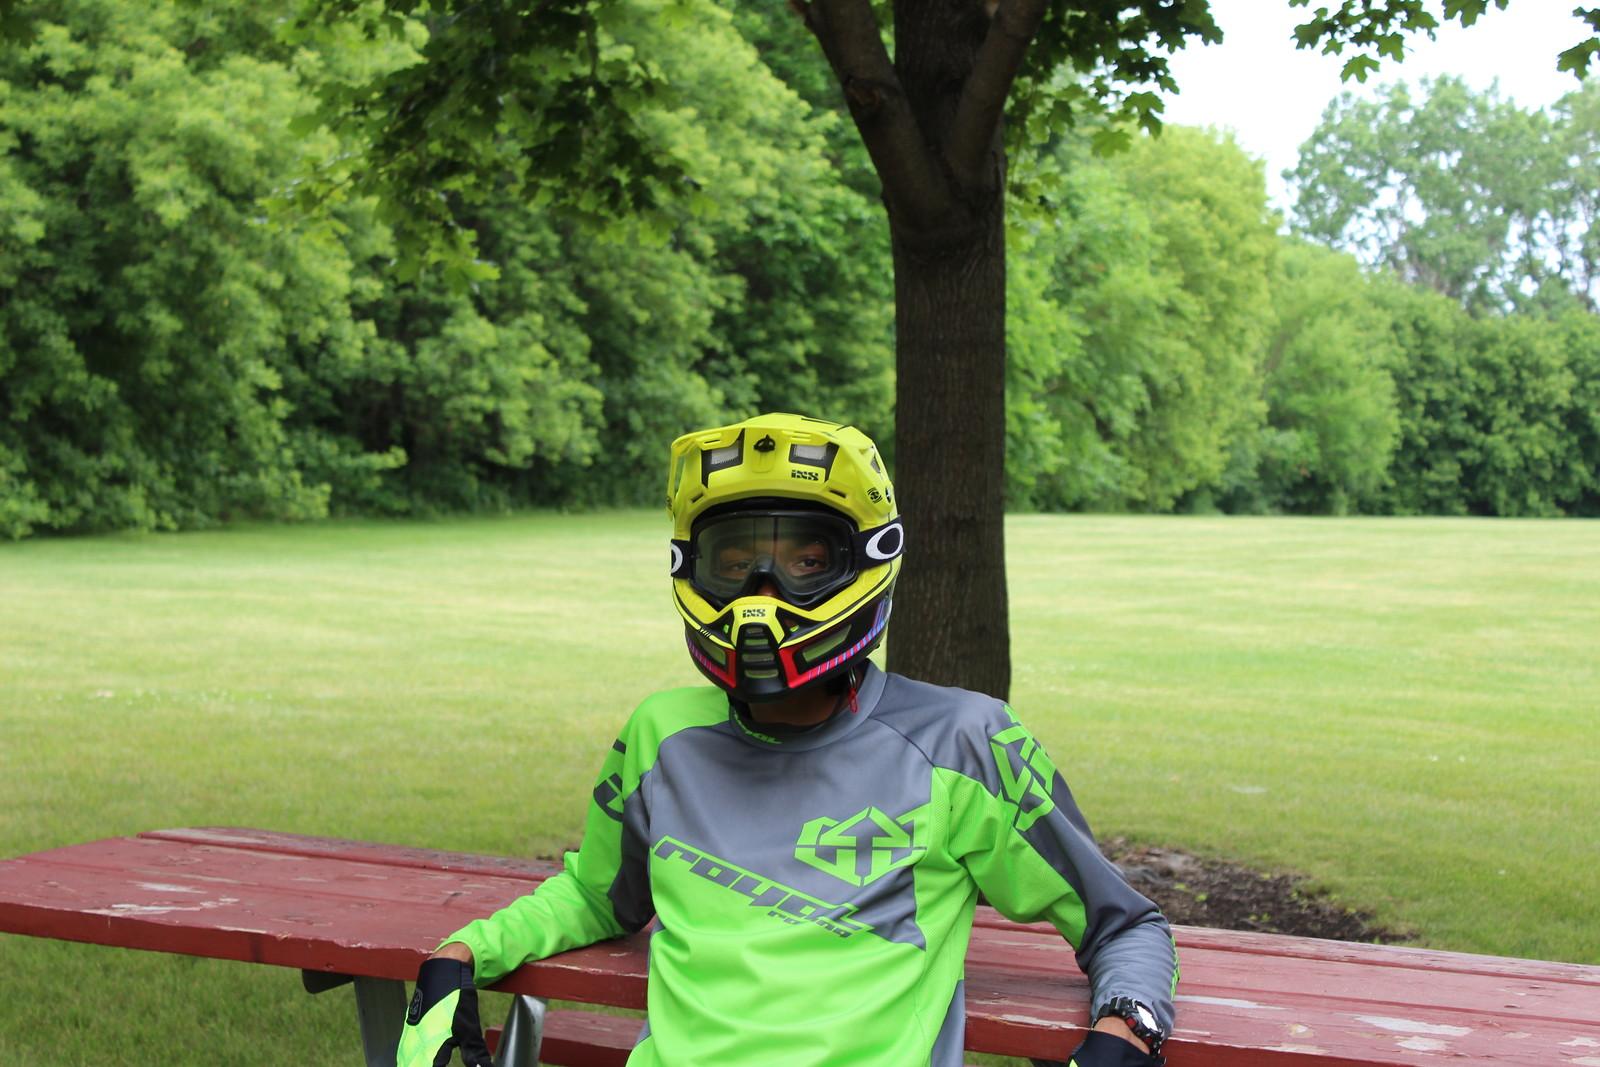 IMG 5443 - MadMaxFlexin - Mountain Biking Pictures - Vital MTB